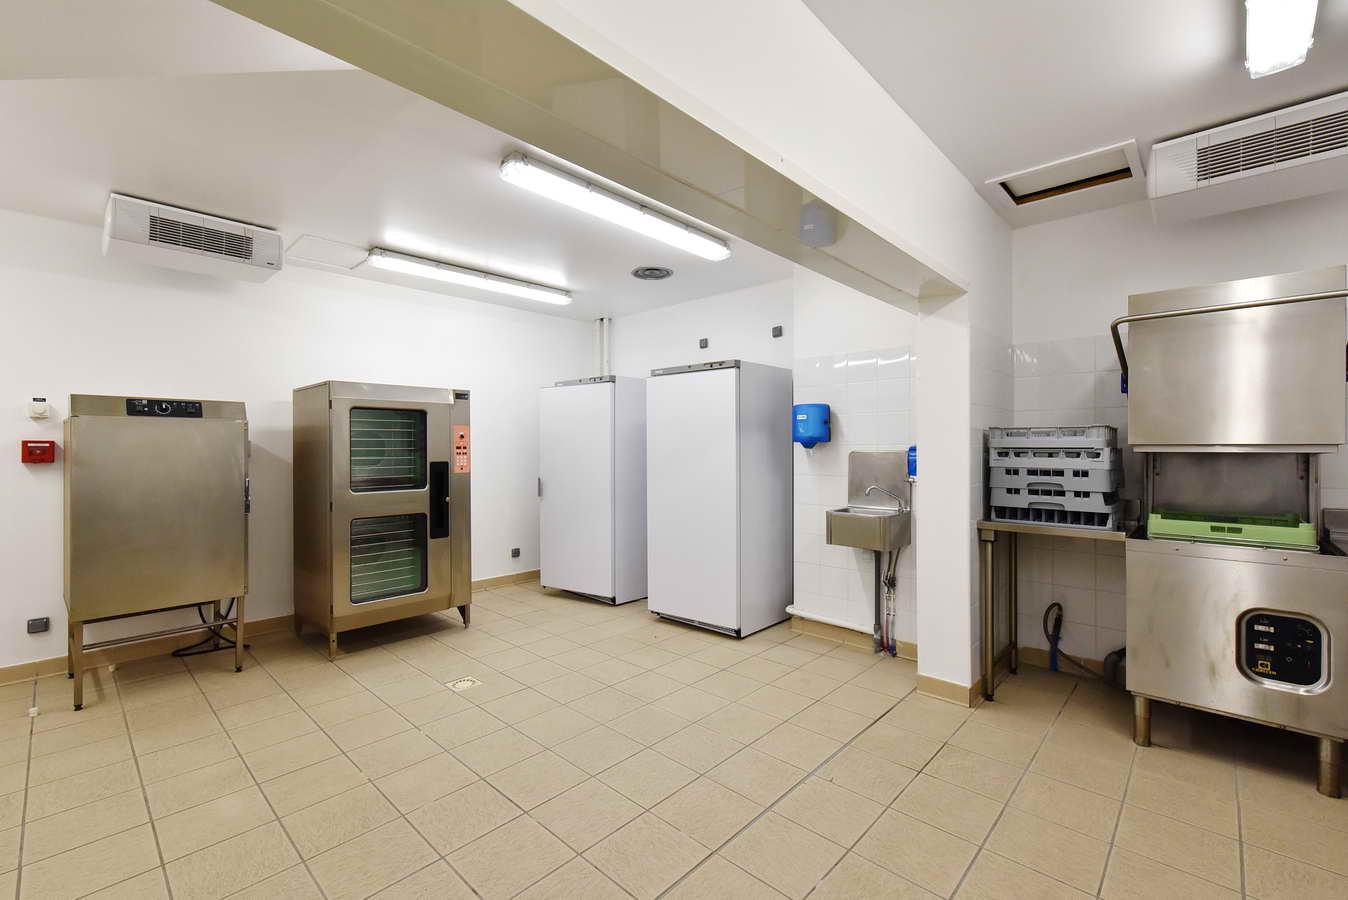 Salle polyvalente, cuisine